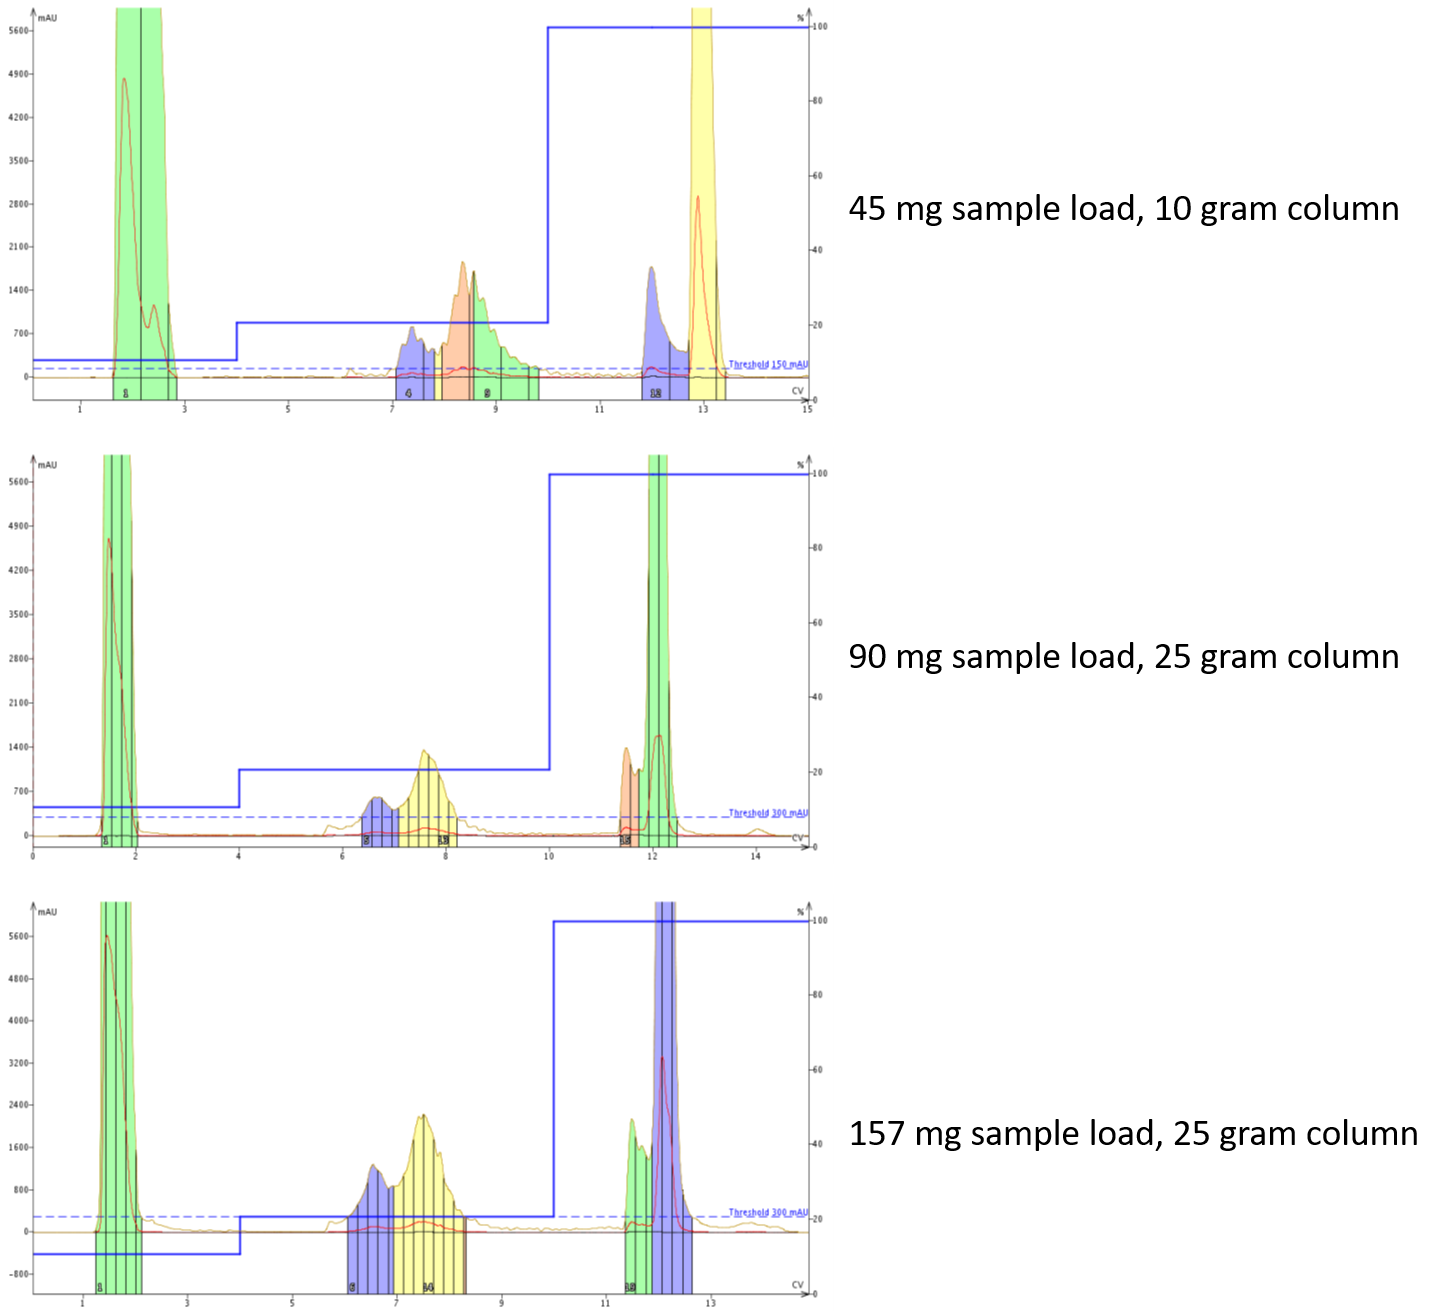 figure3 - increasing  sample load